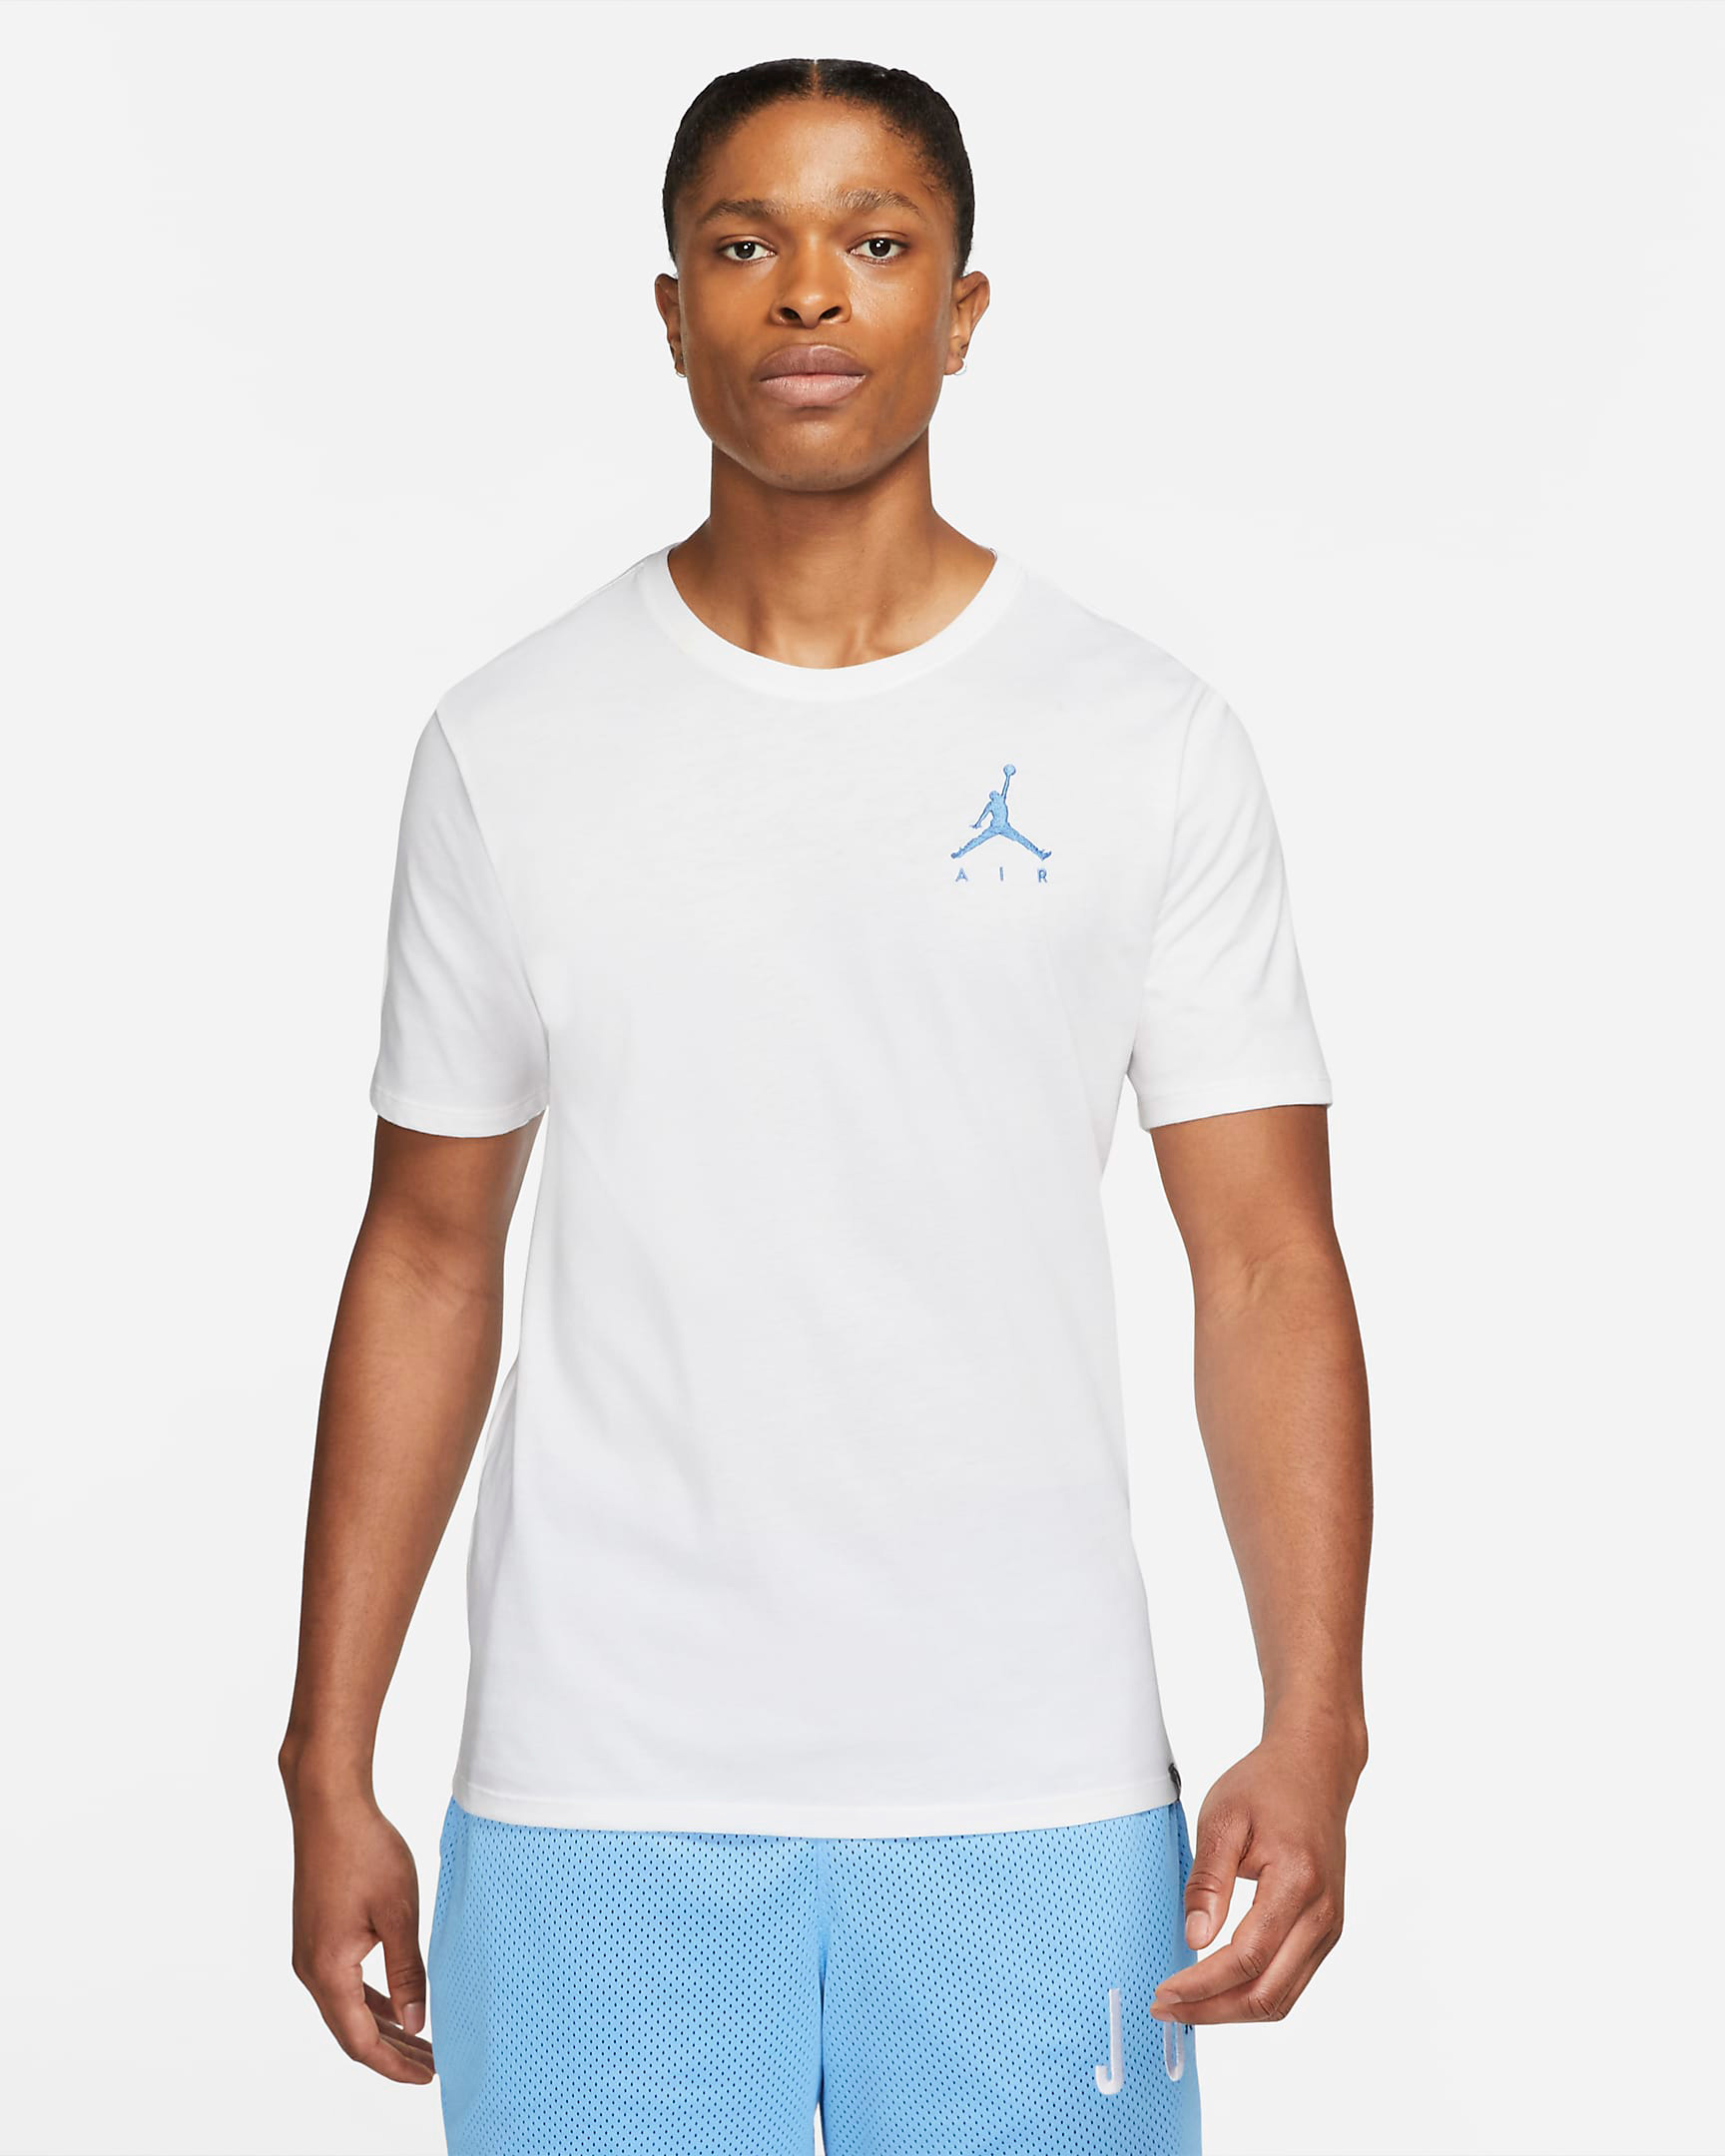 air-jordan-13-obsidian-t-shirt-1